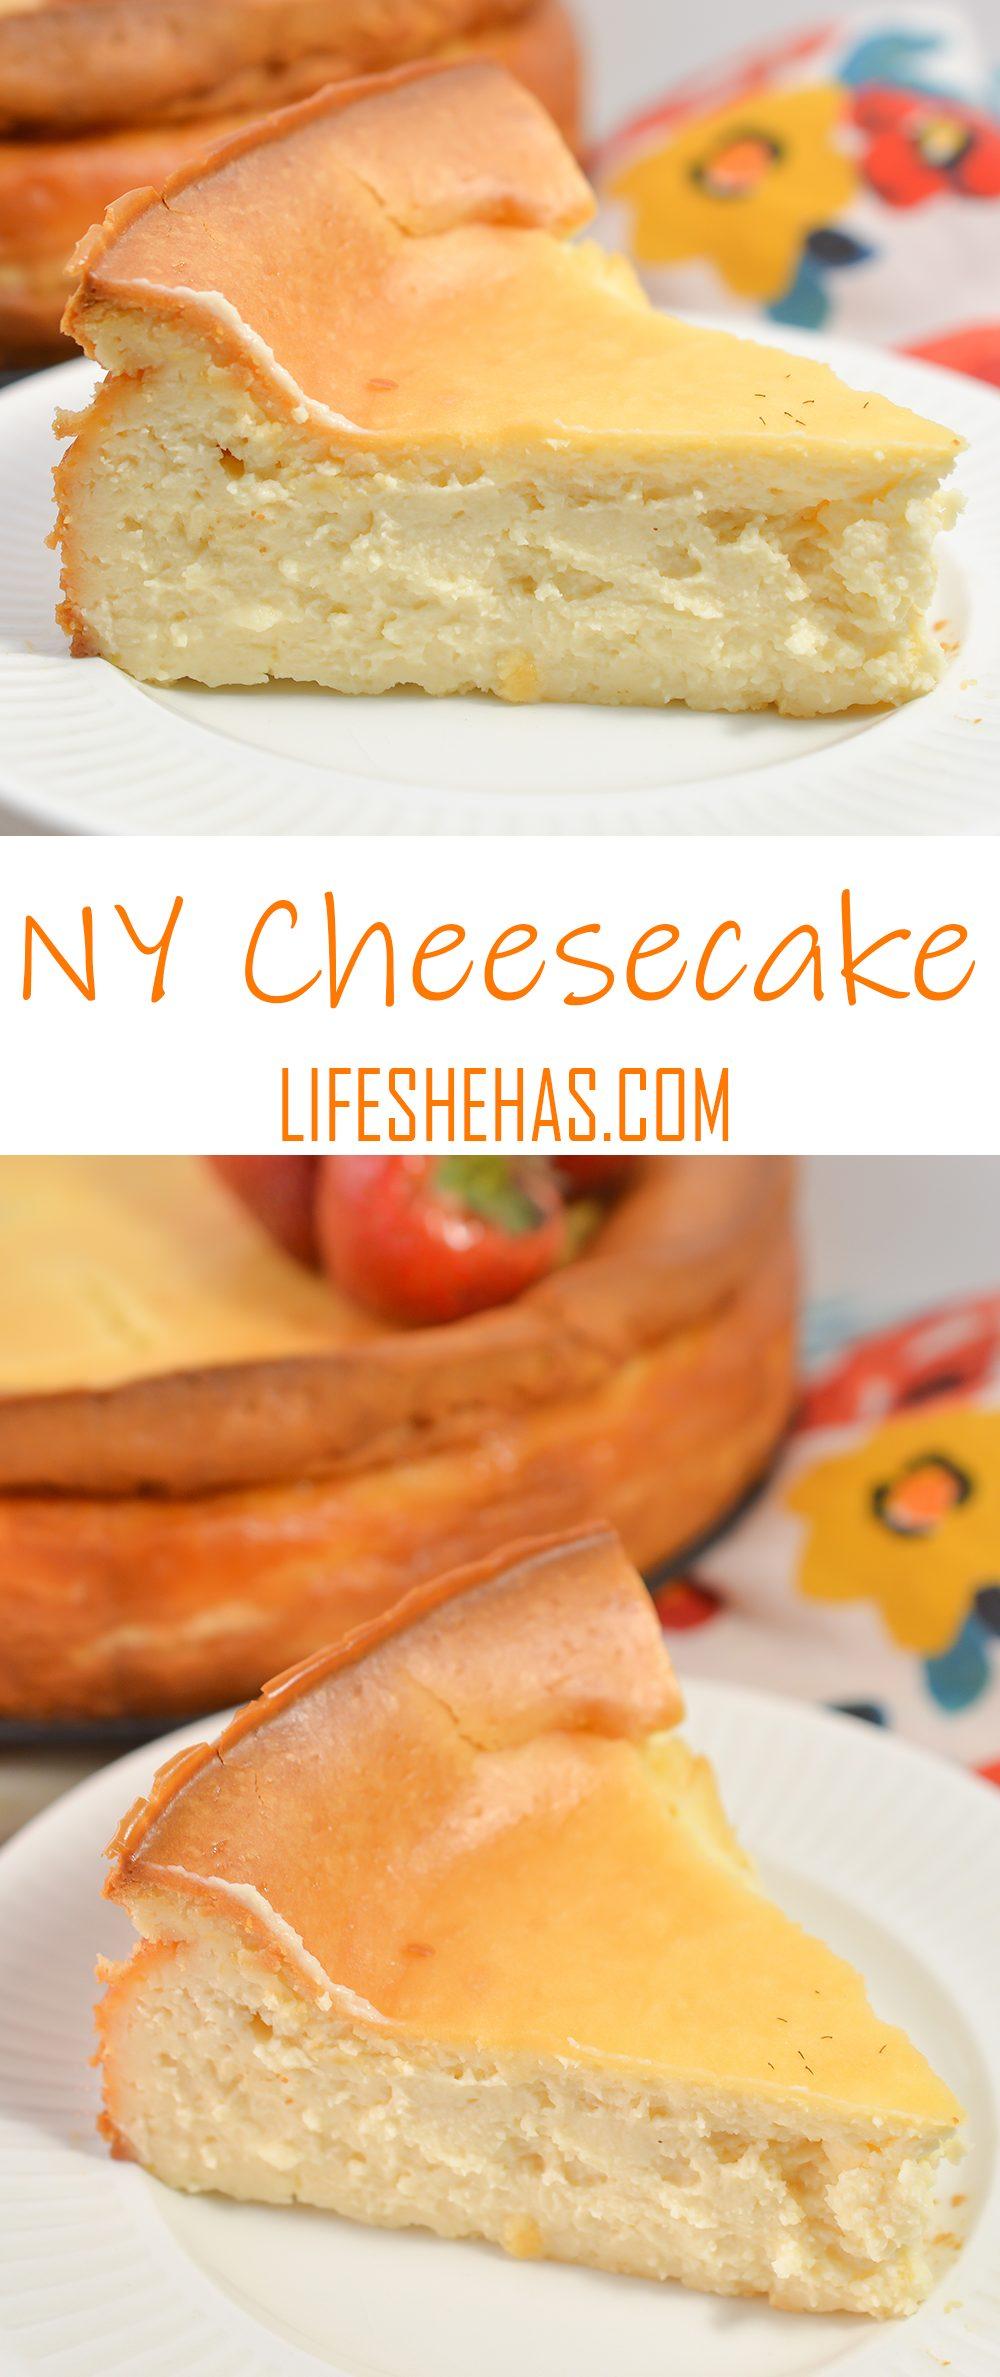 ny cheesecake pinterest pin template